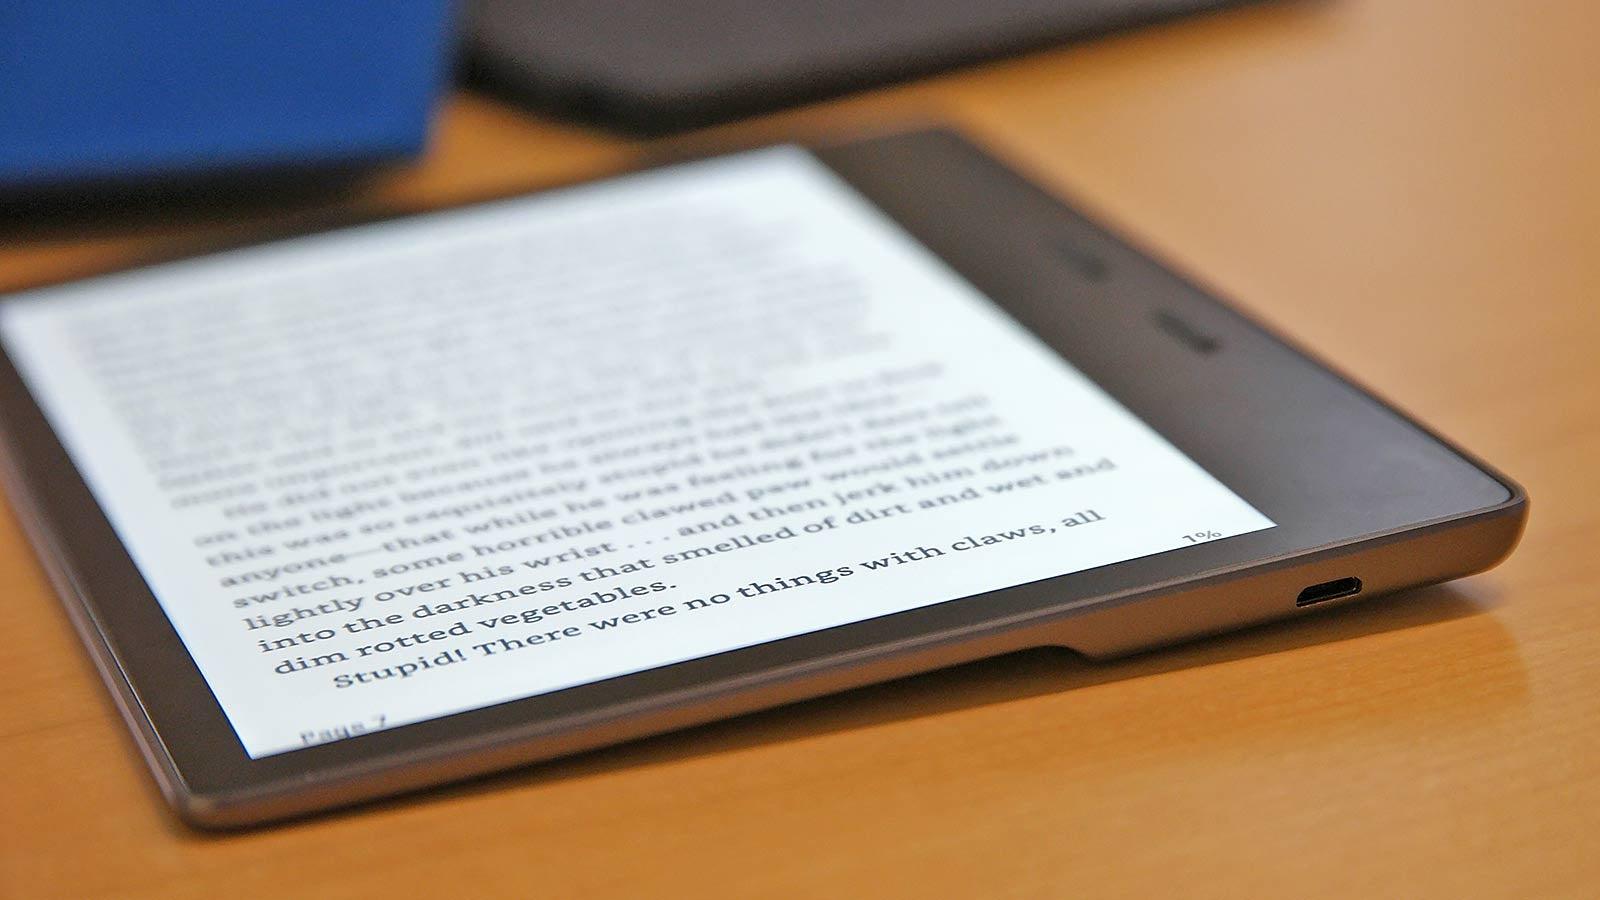 Amazon's Sick High-End Kindle Got a Serious Overhaul